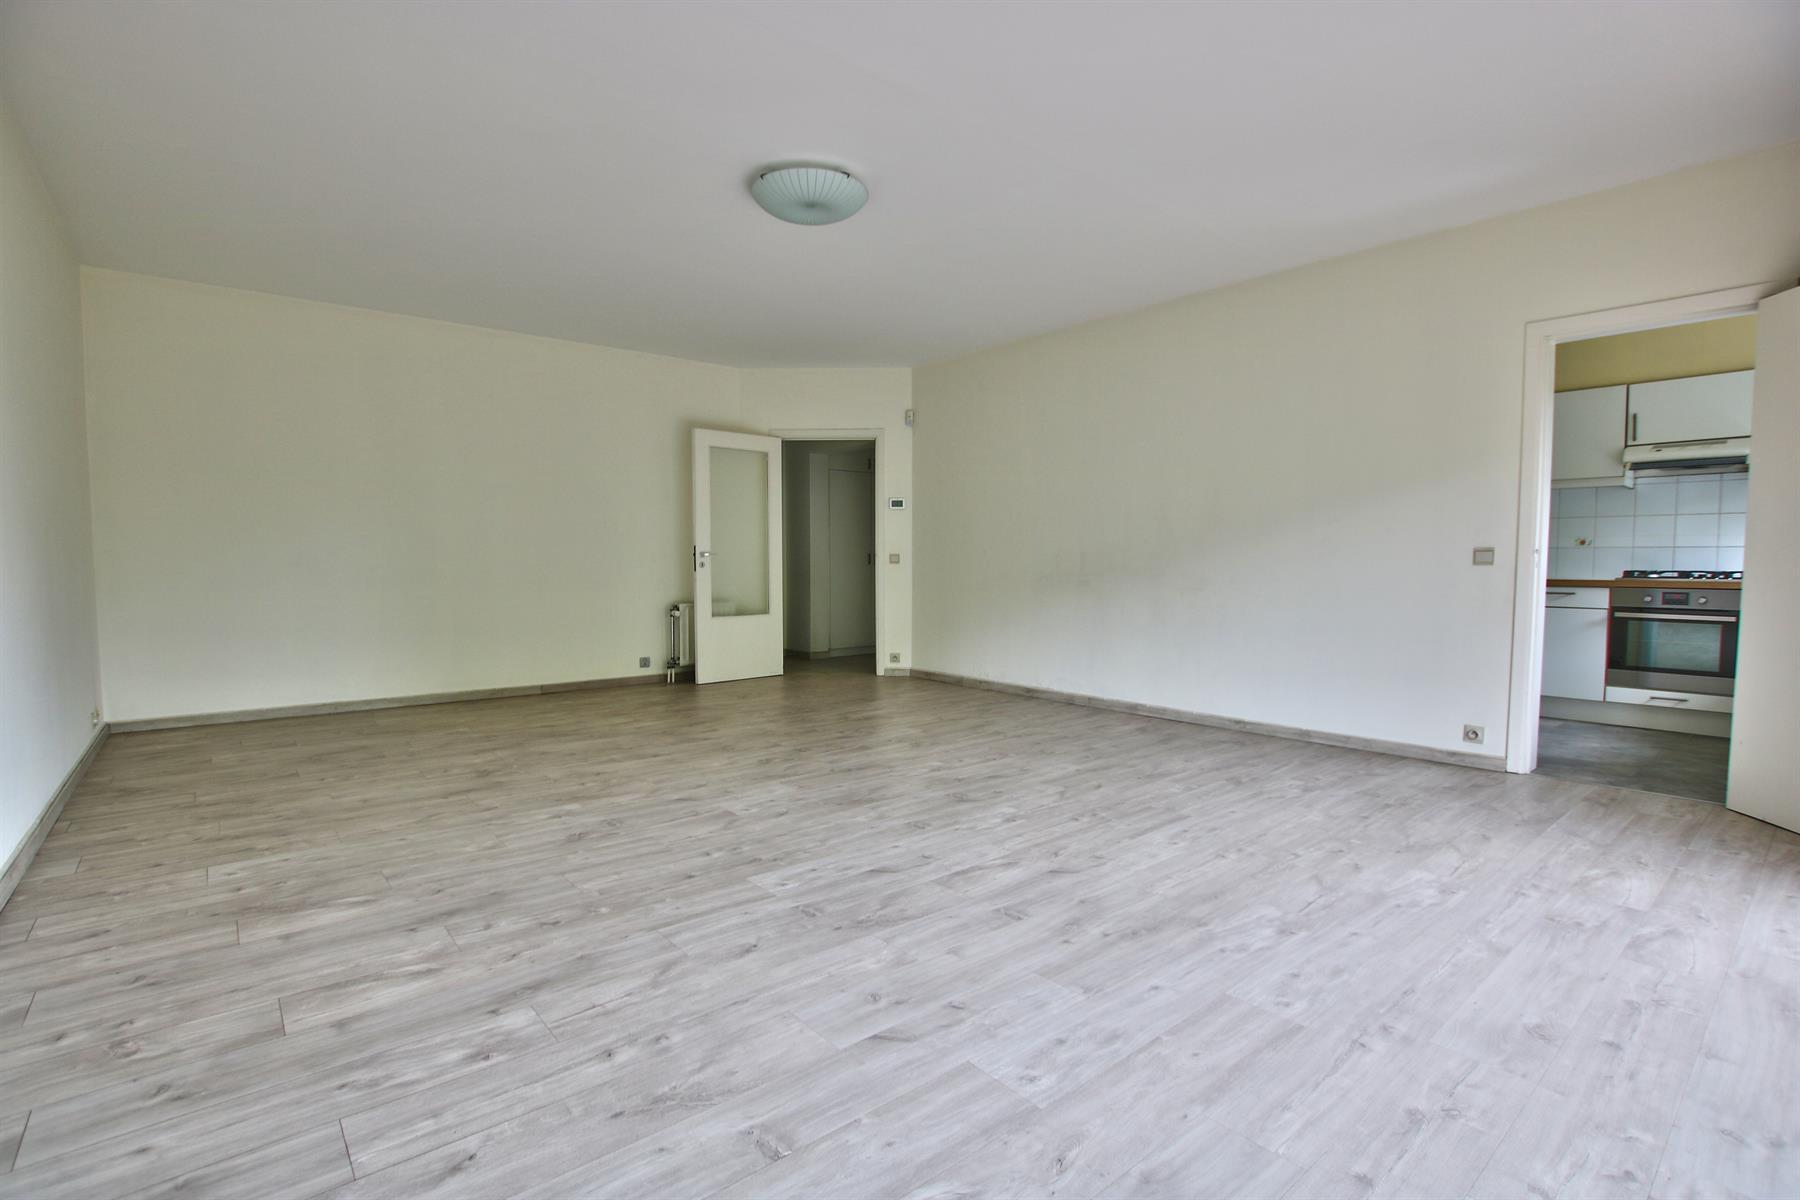 Appartement - Auderghem - #4517295-1